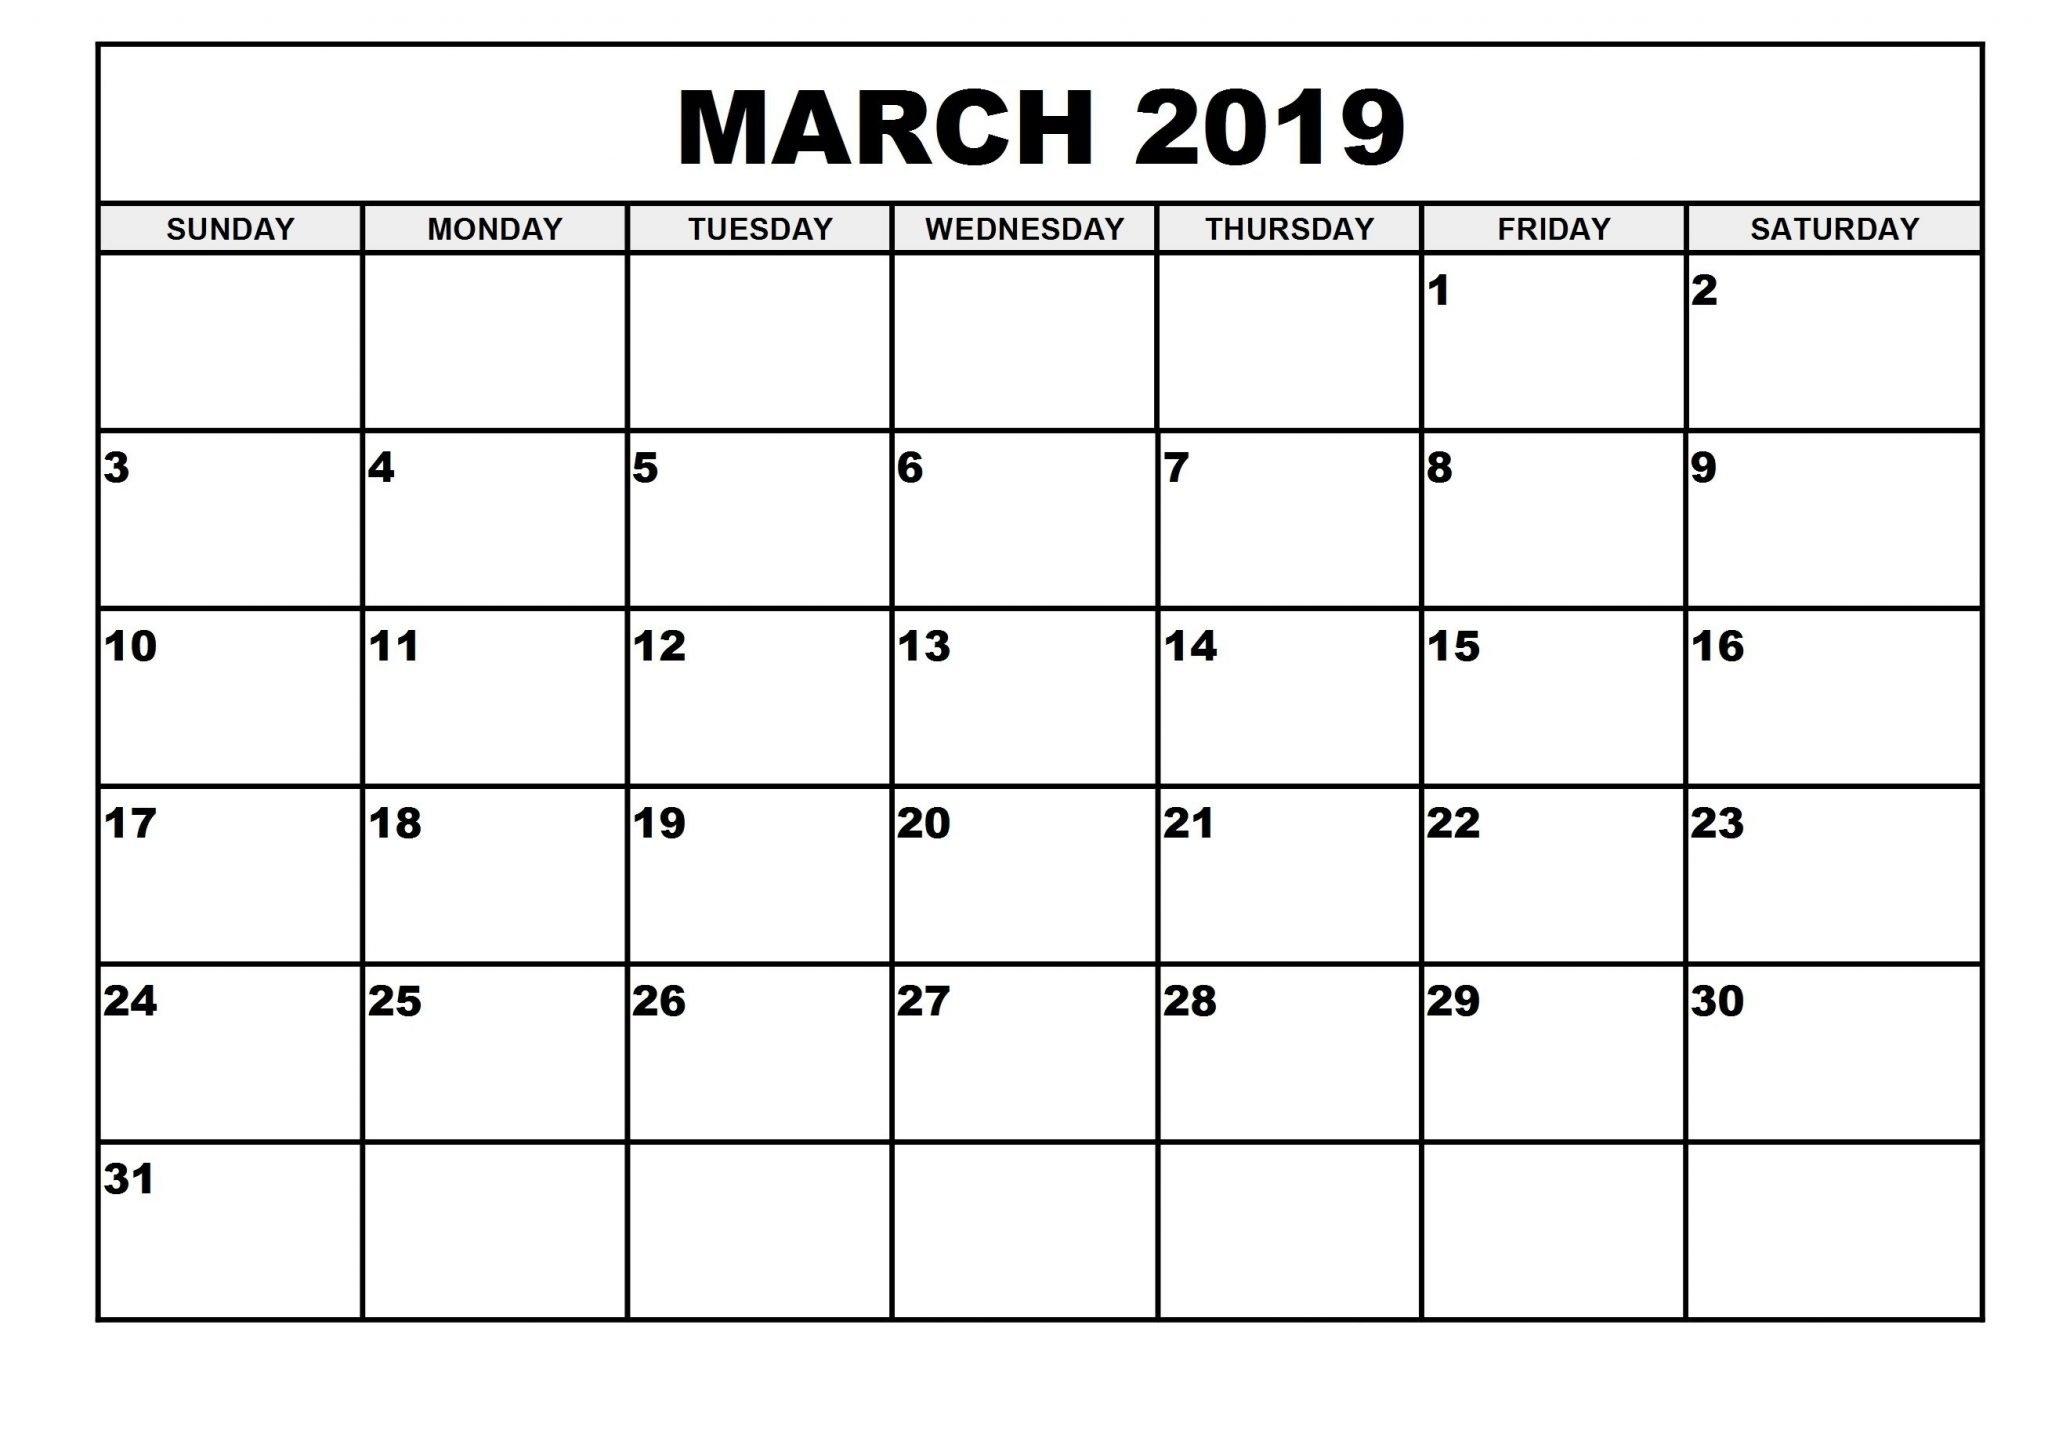 2019 Monthly Printable March 2019 Calendar - Printable Calendar 2019 March 1 2019 Calendar